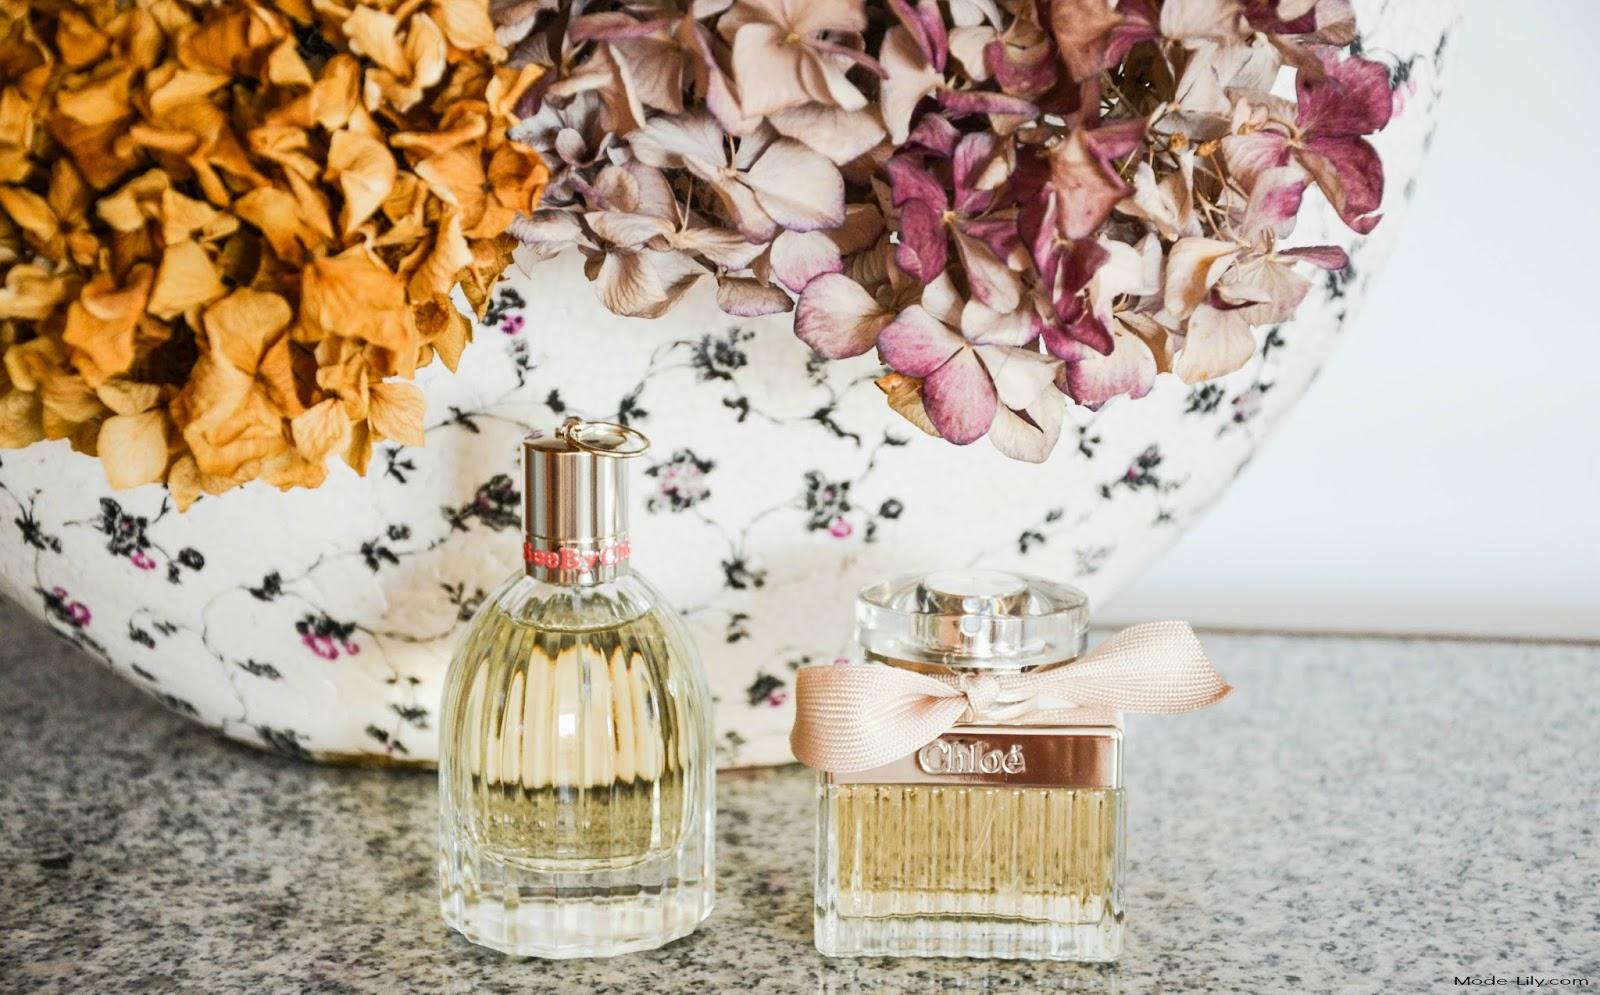 Review: See by Chloe, Eau De Parfum Spray